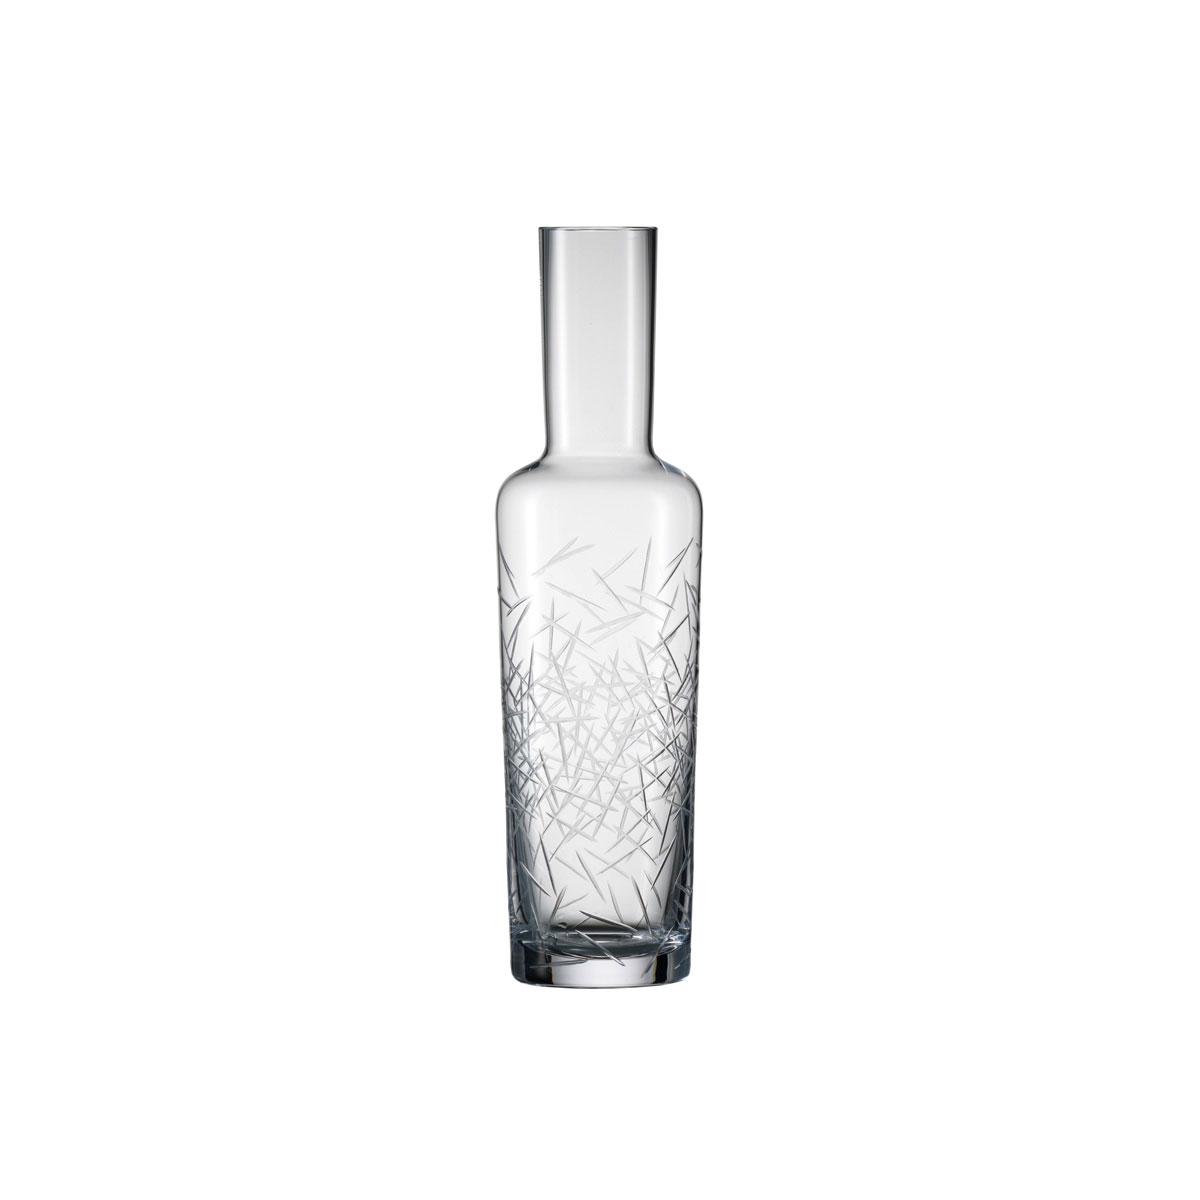 Schott Zwiesel Tritan Crystal, 1872 Charles Schumann Hommage Glace Water Crystal Carafe